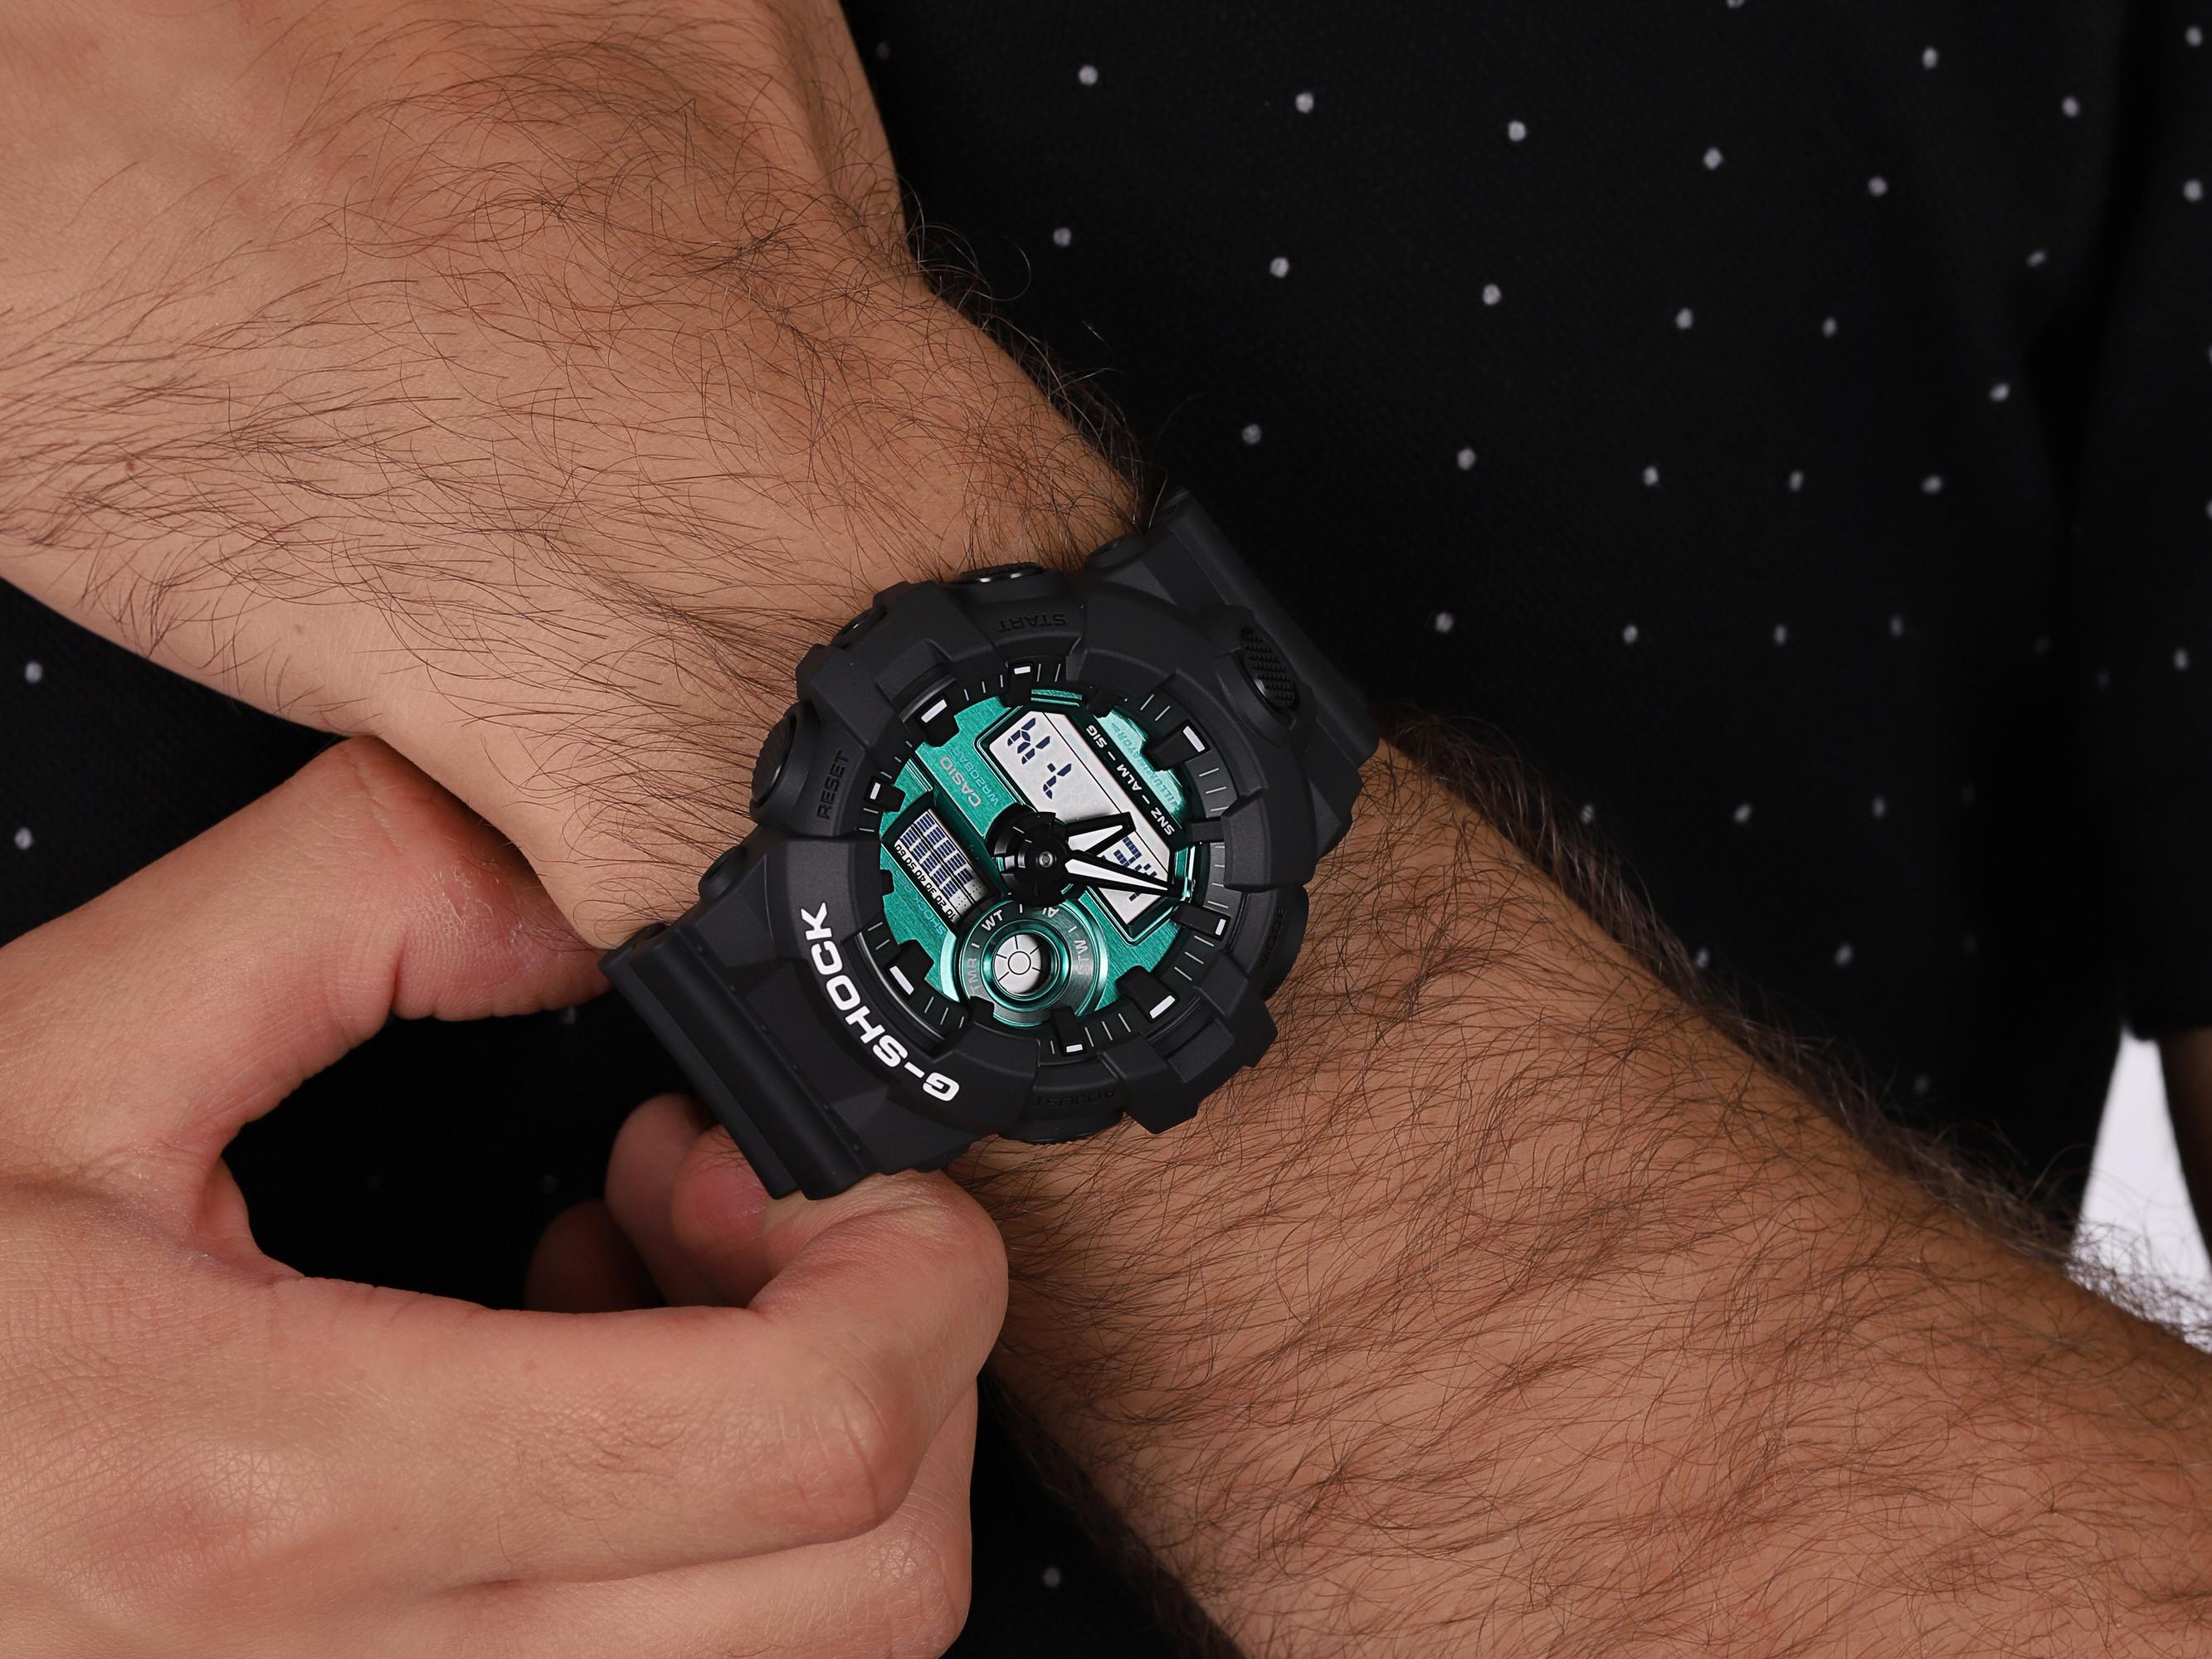 G-SHOCK GA-700MG-1AER zegarek czarny sportowy G-SHOCK Original pasek